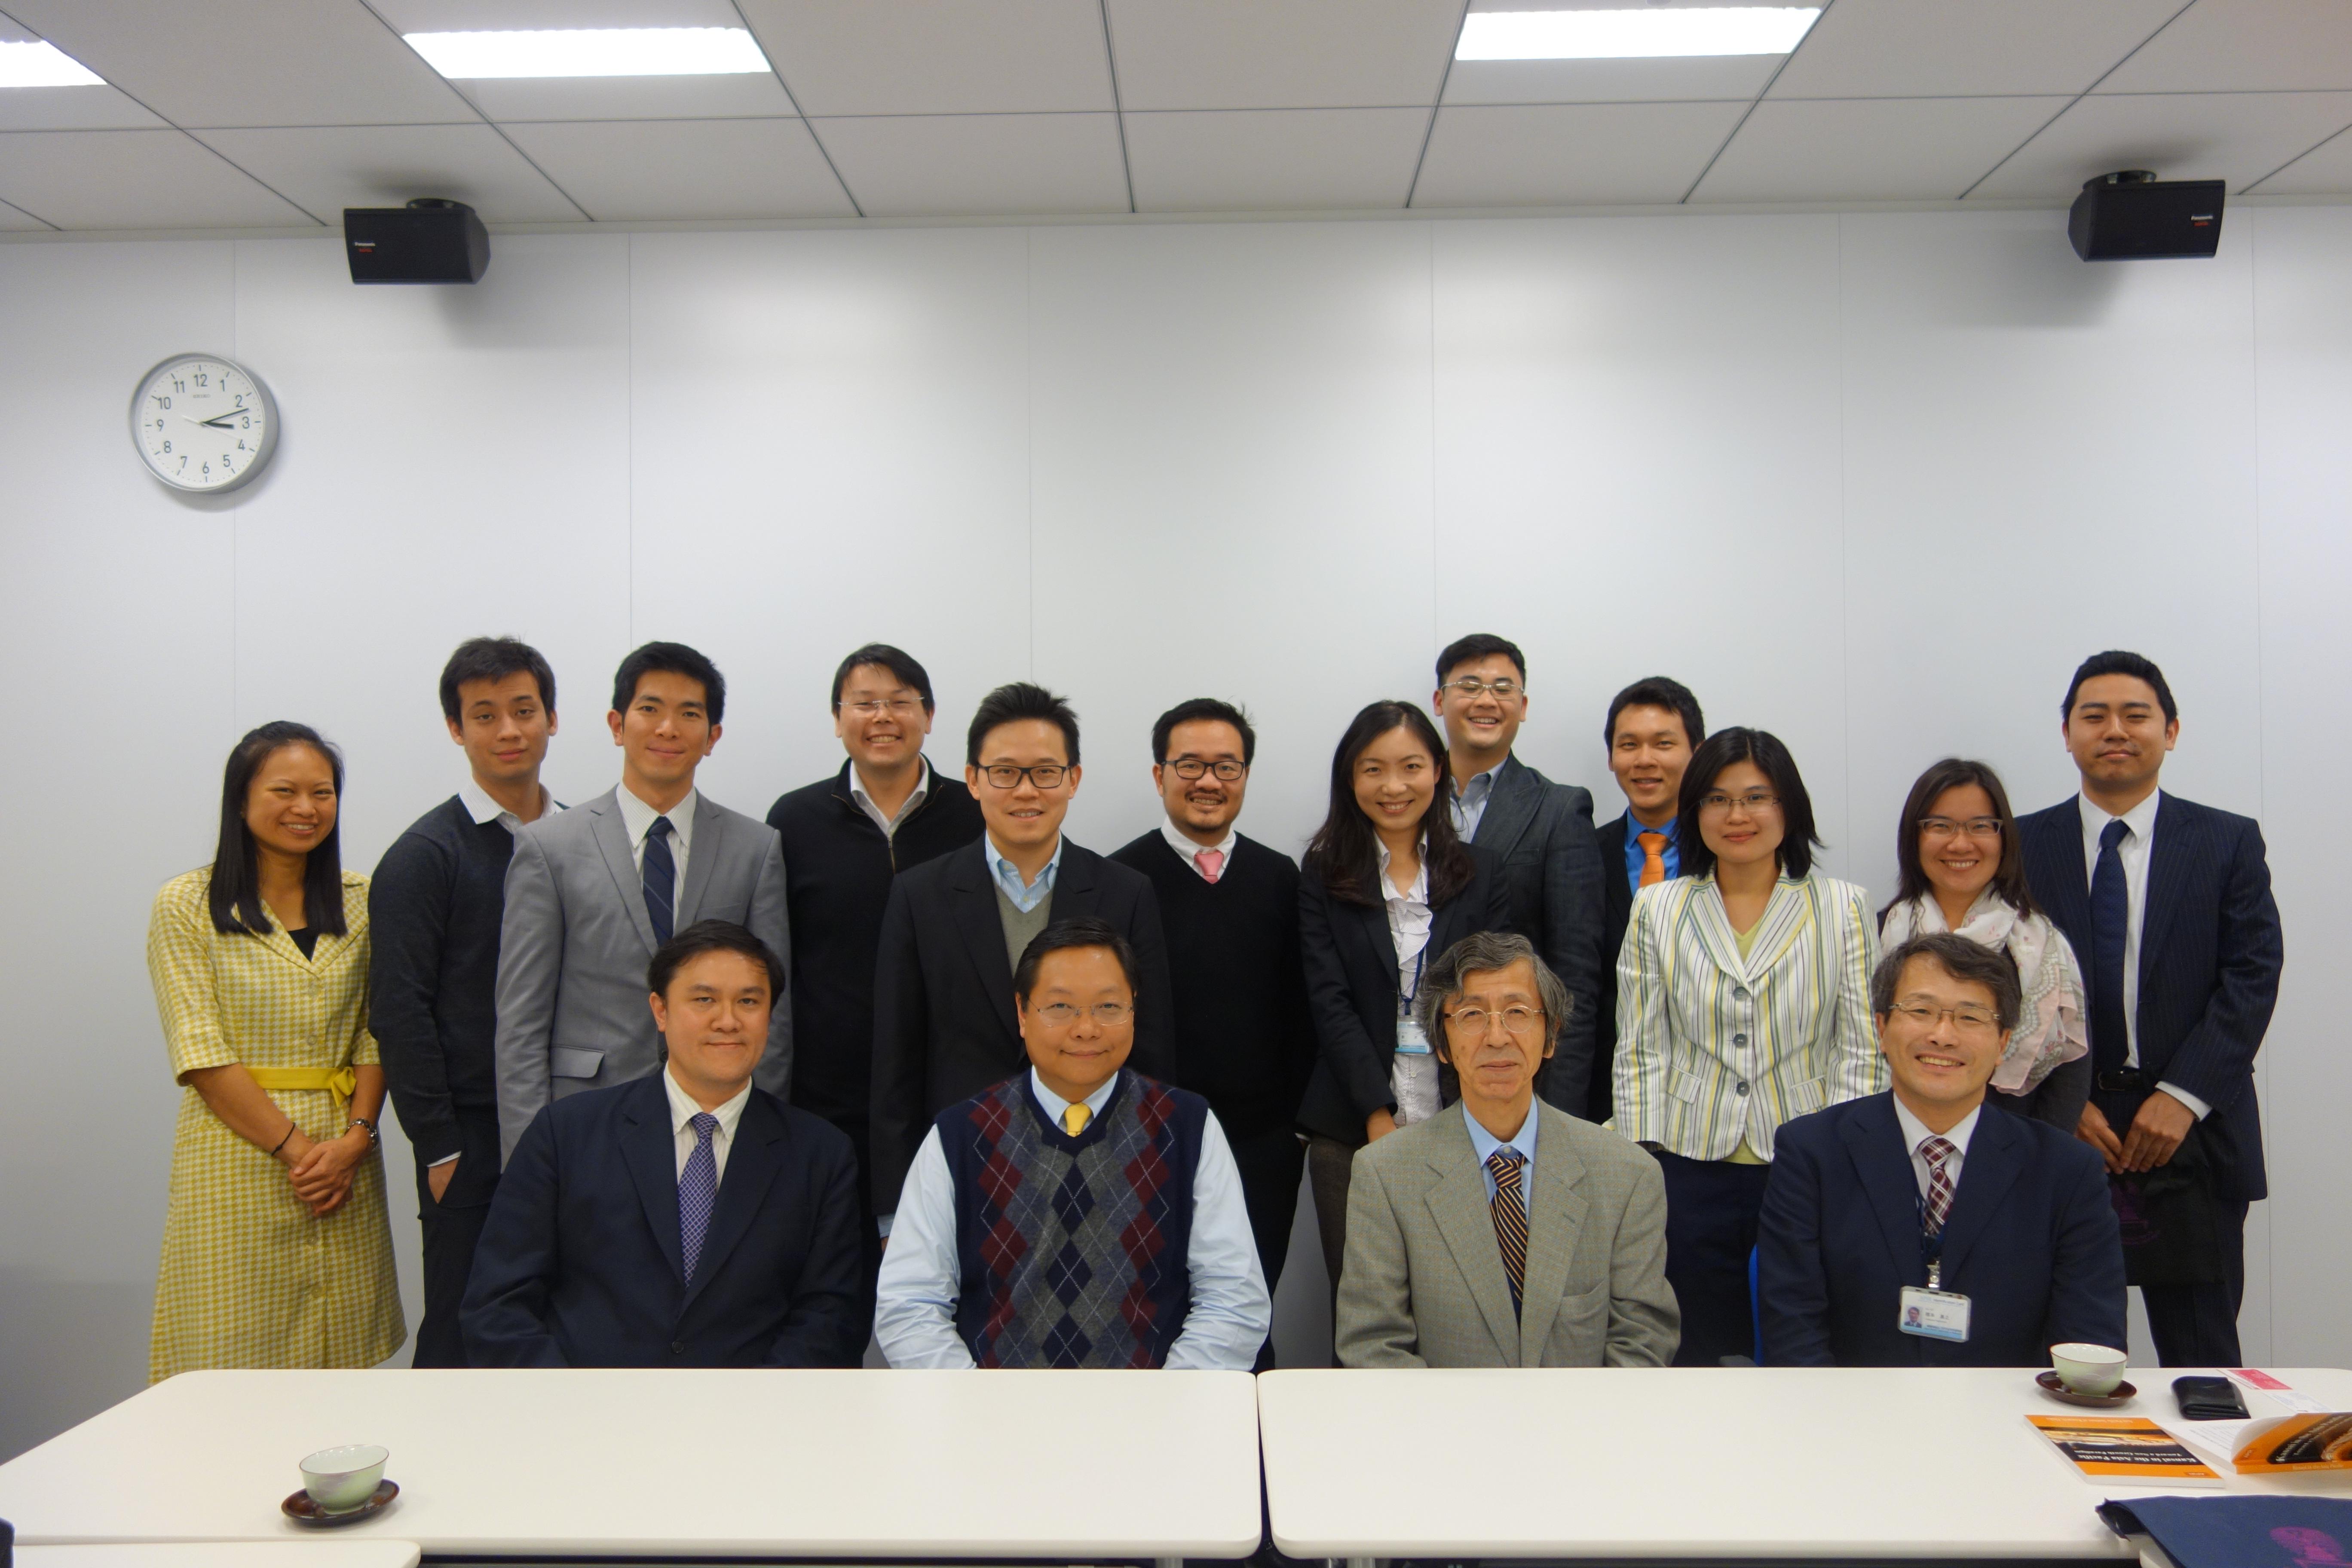 Chulalongkorn大学との意見交換